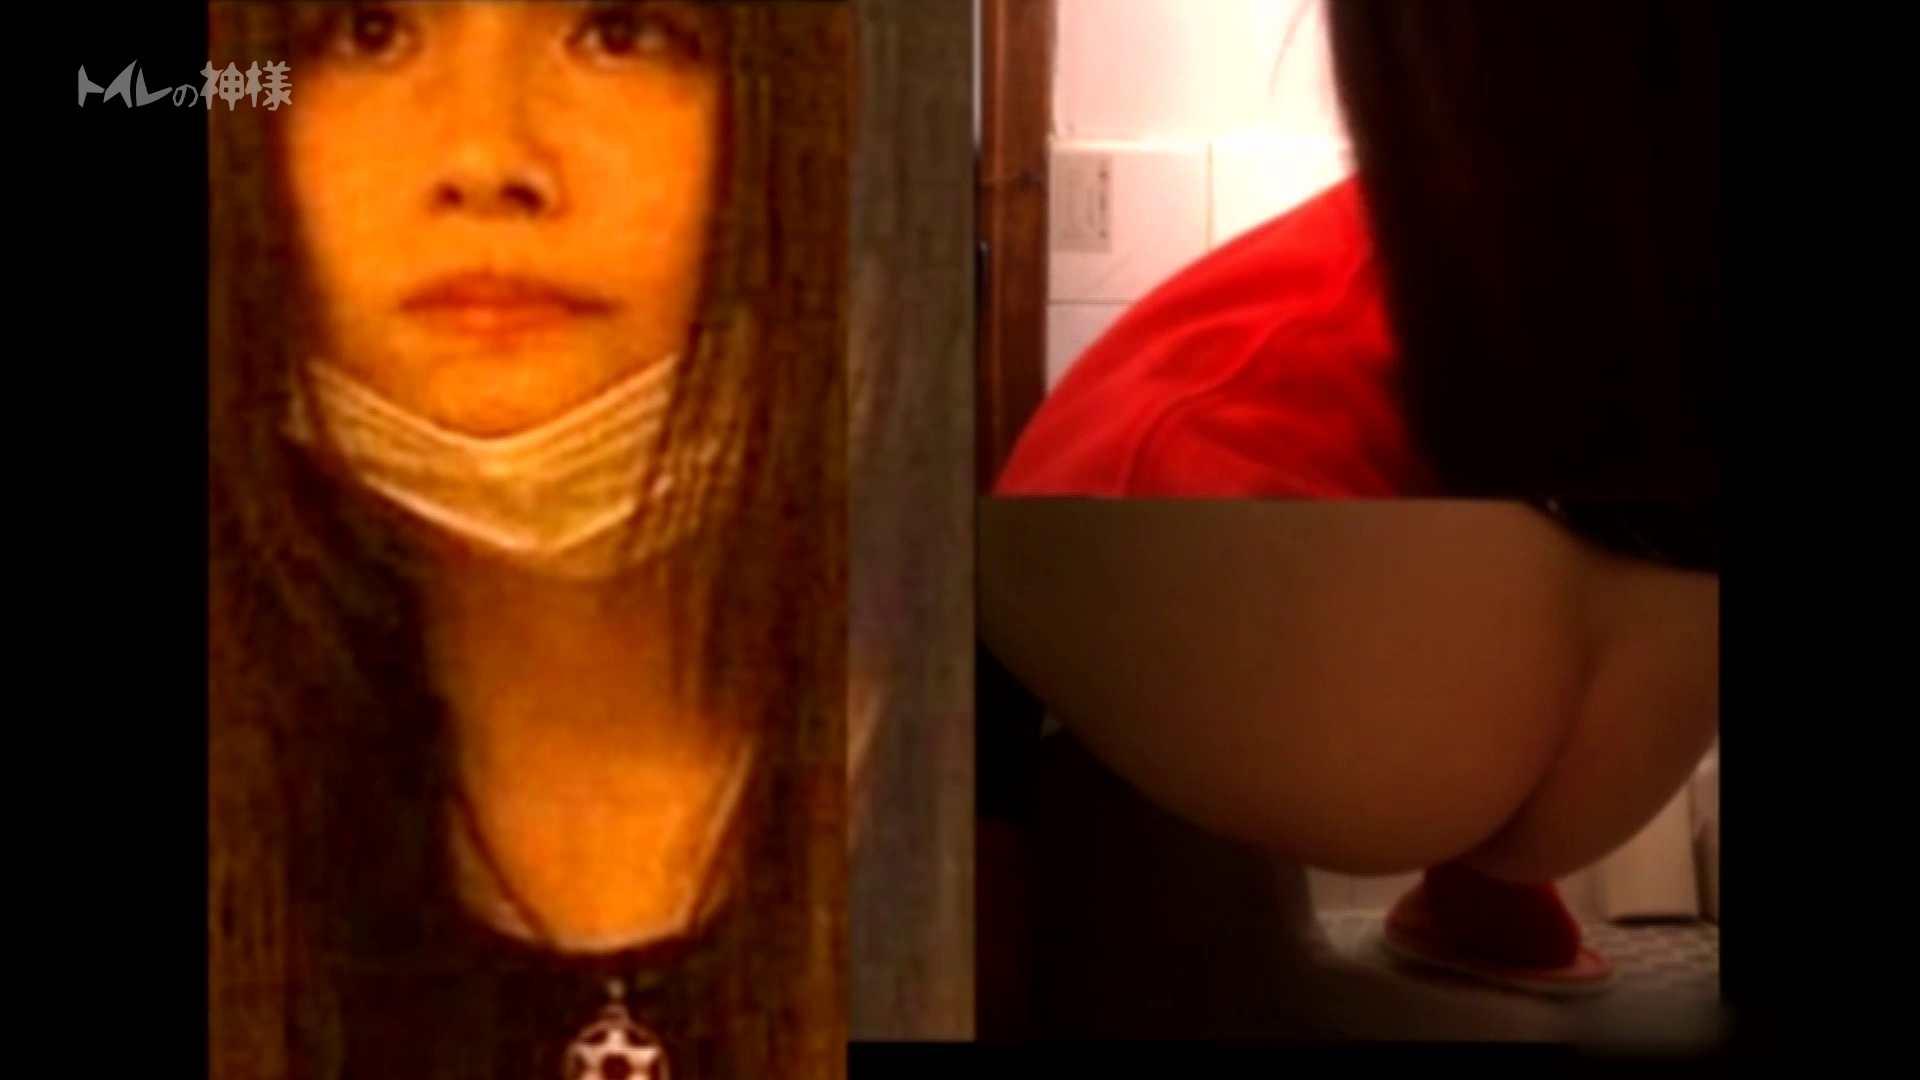 Vol.02 花の女子大生うんこ盗撮2 トイレの実態 盗撮動画紹介 108PIX 63